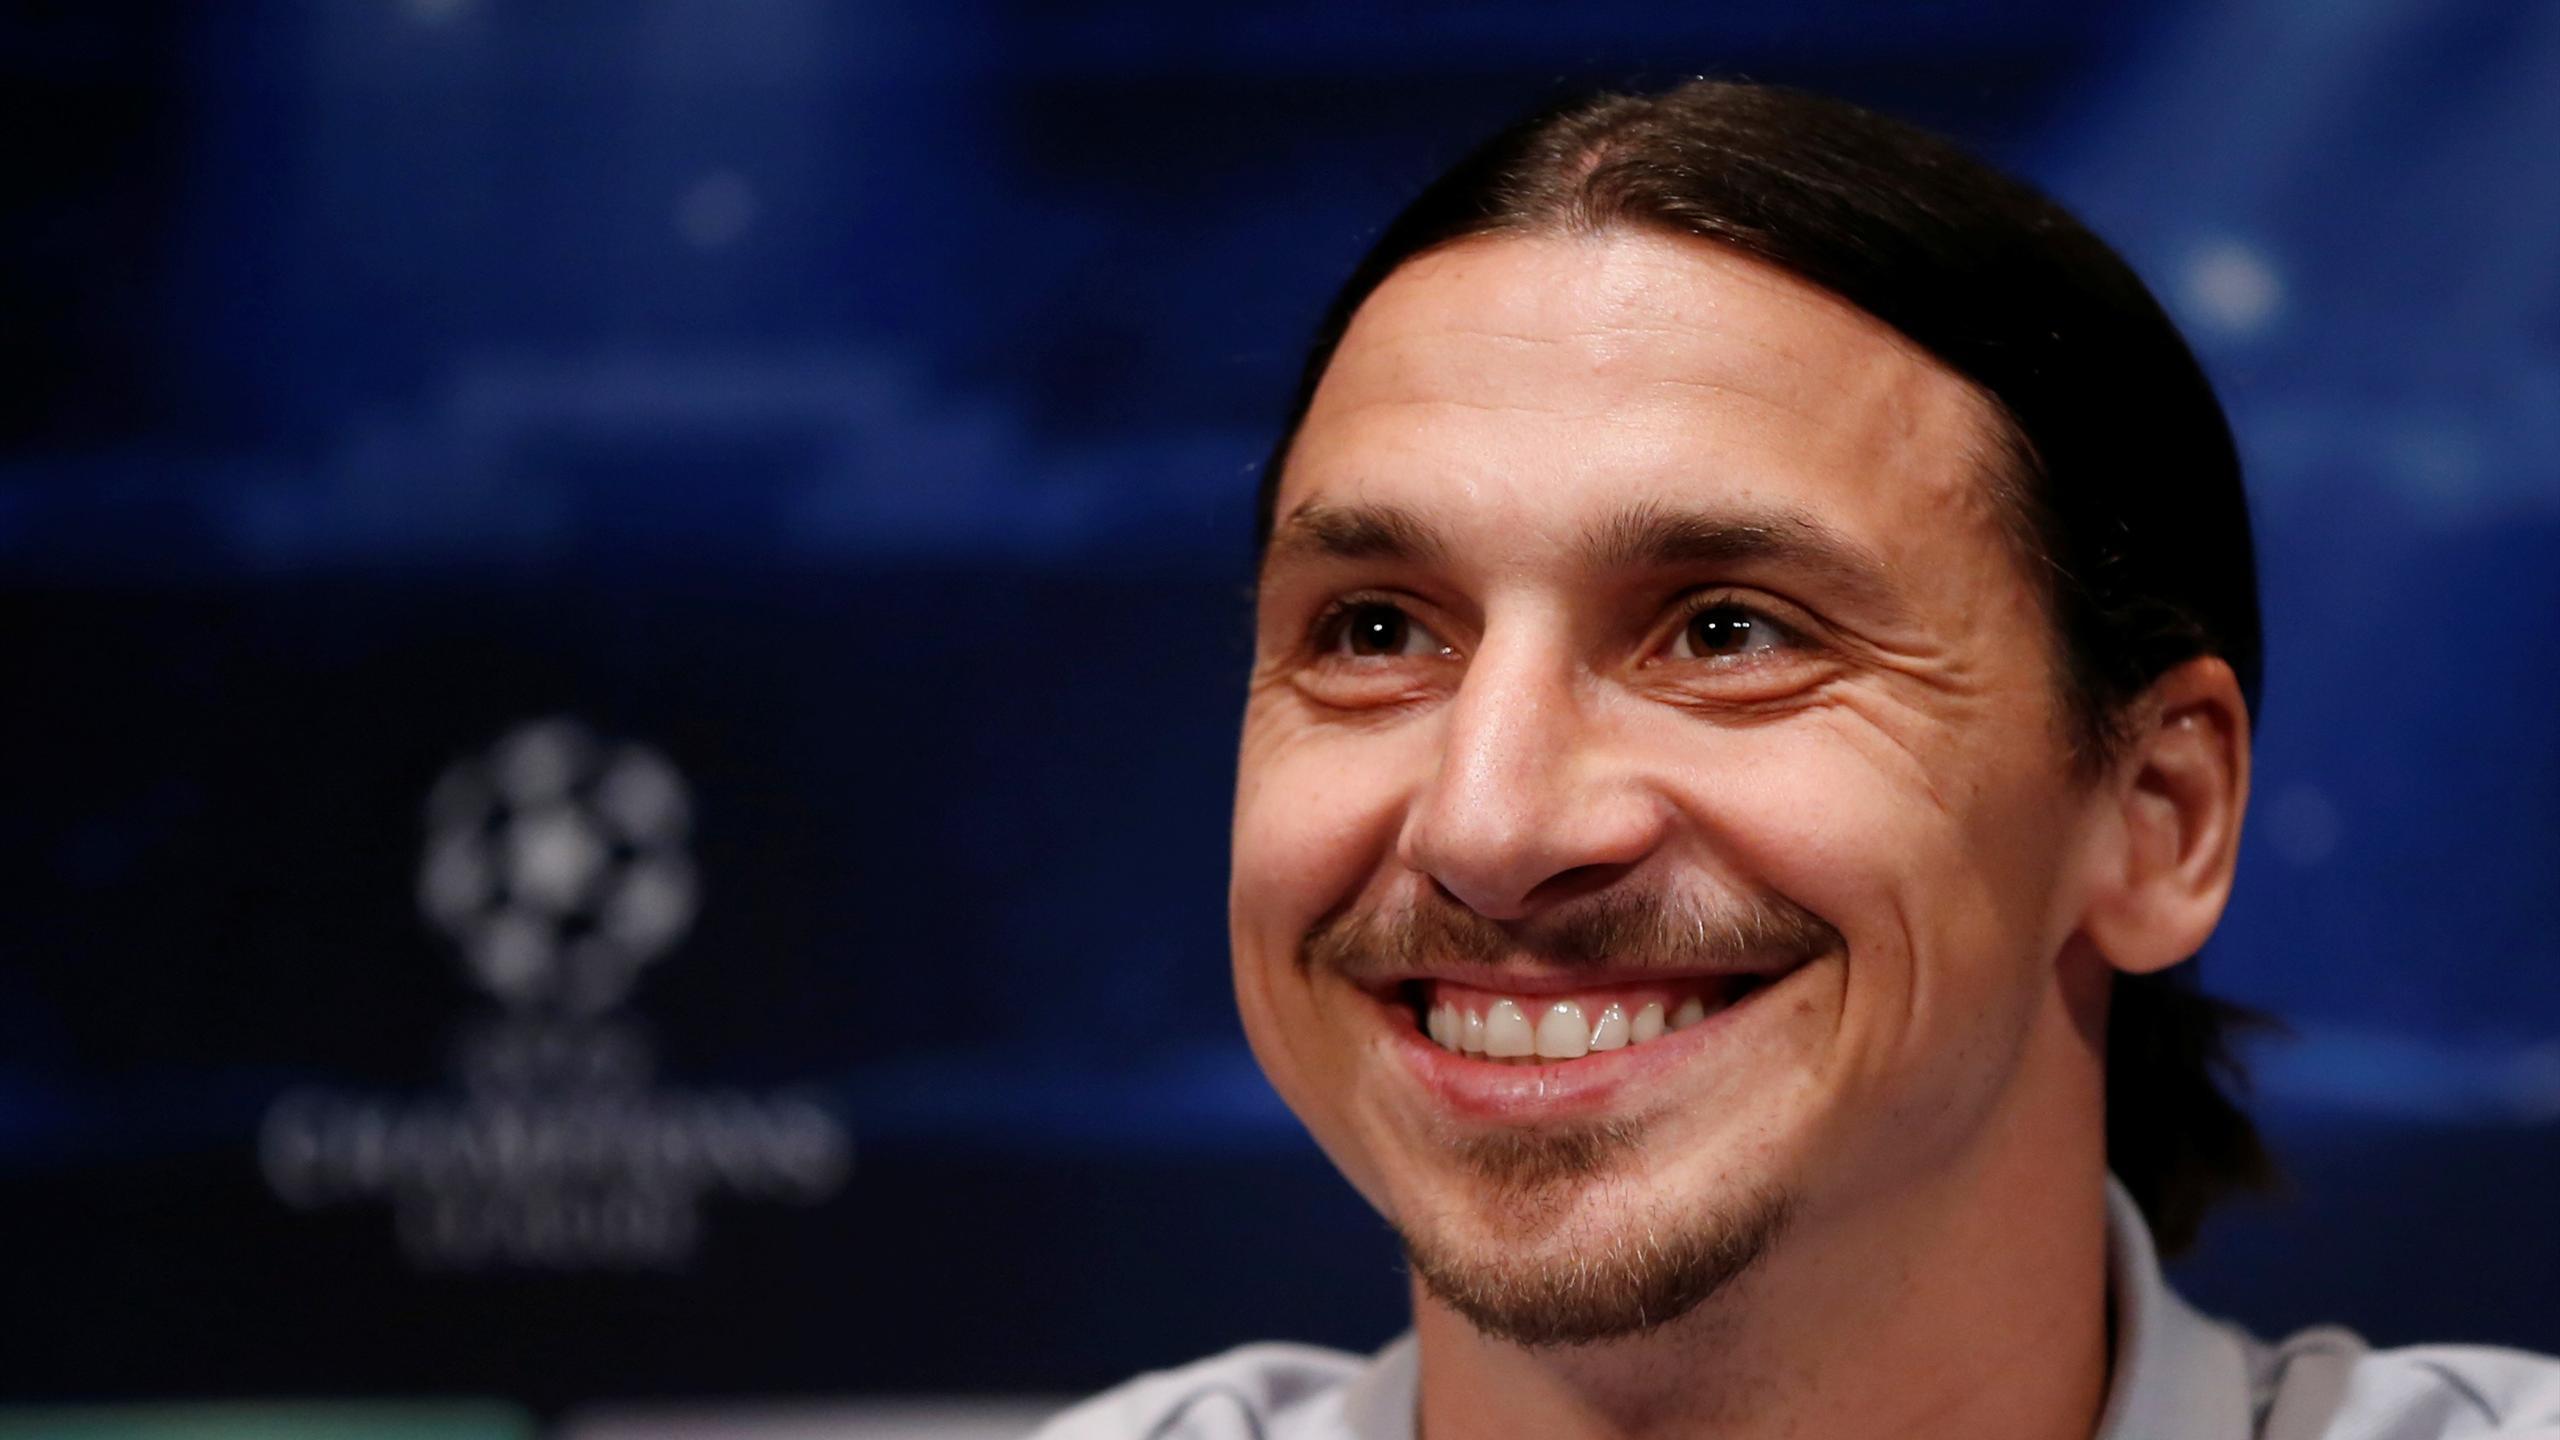 Paris St Germain's Zlatan Ibrahimovic addresses at a news conference